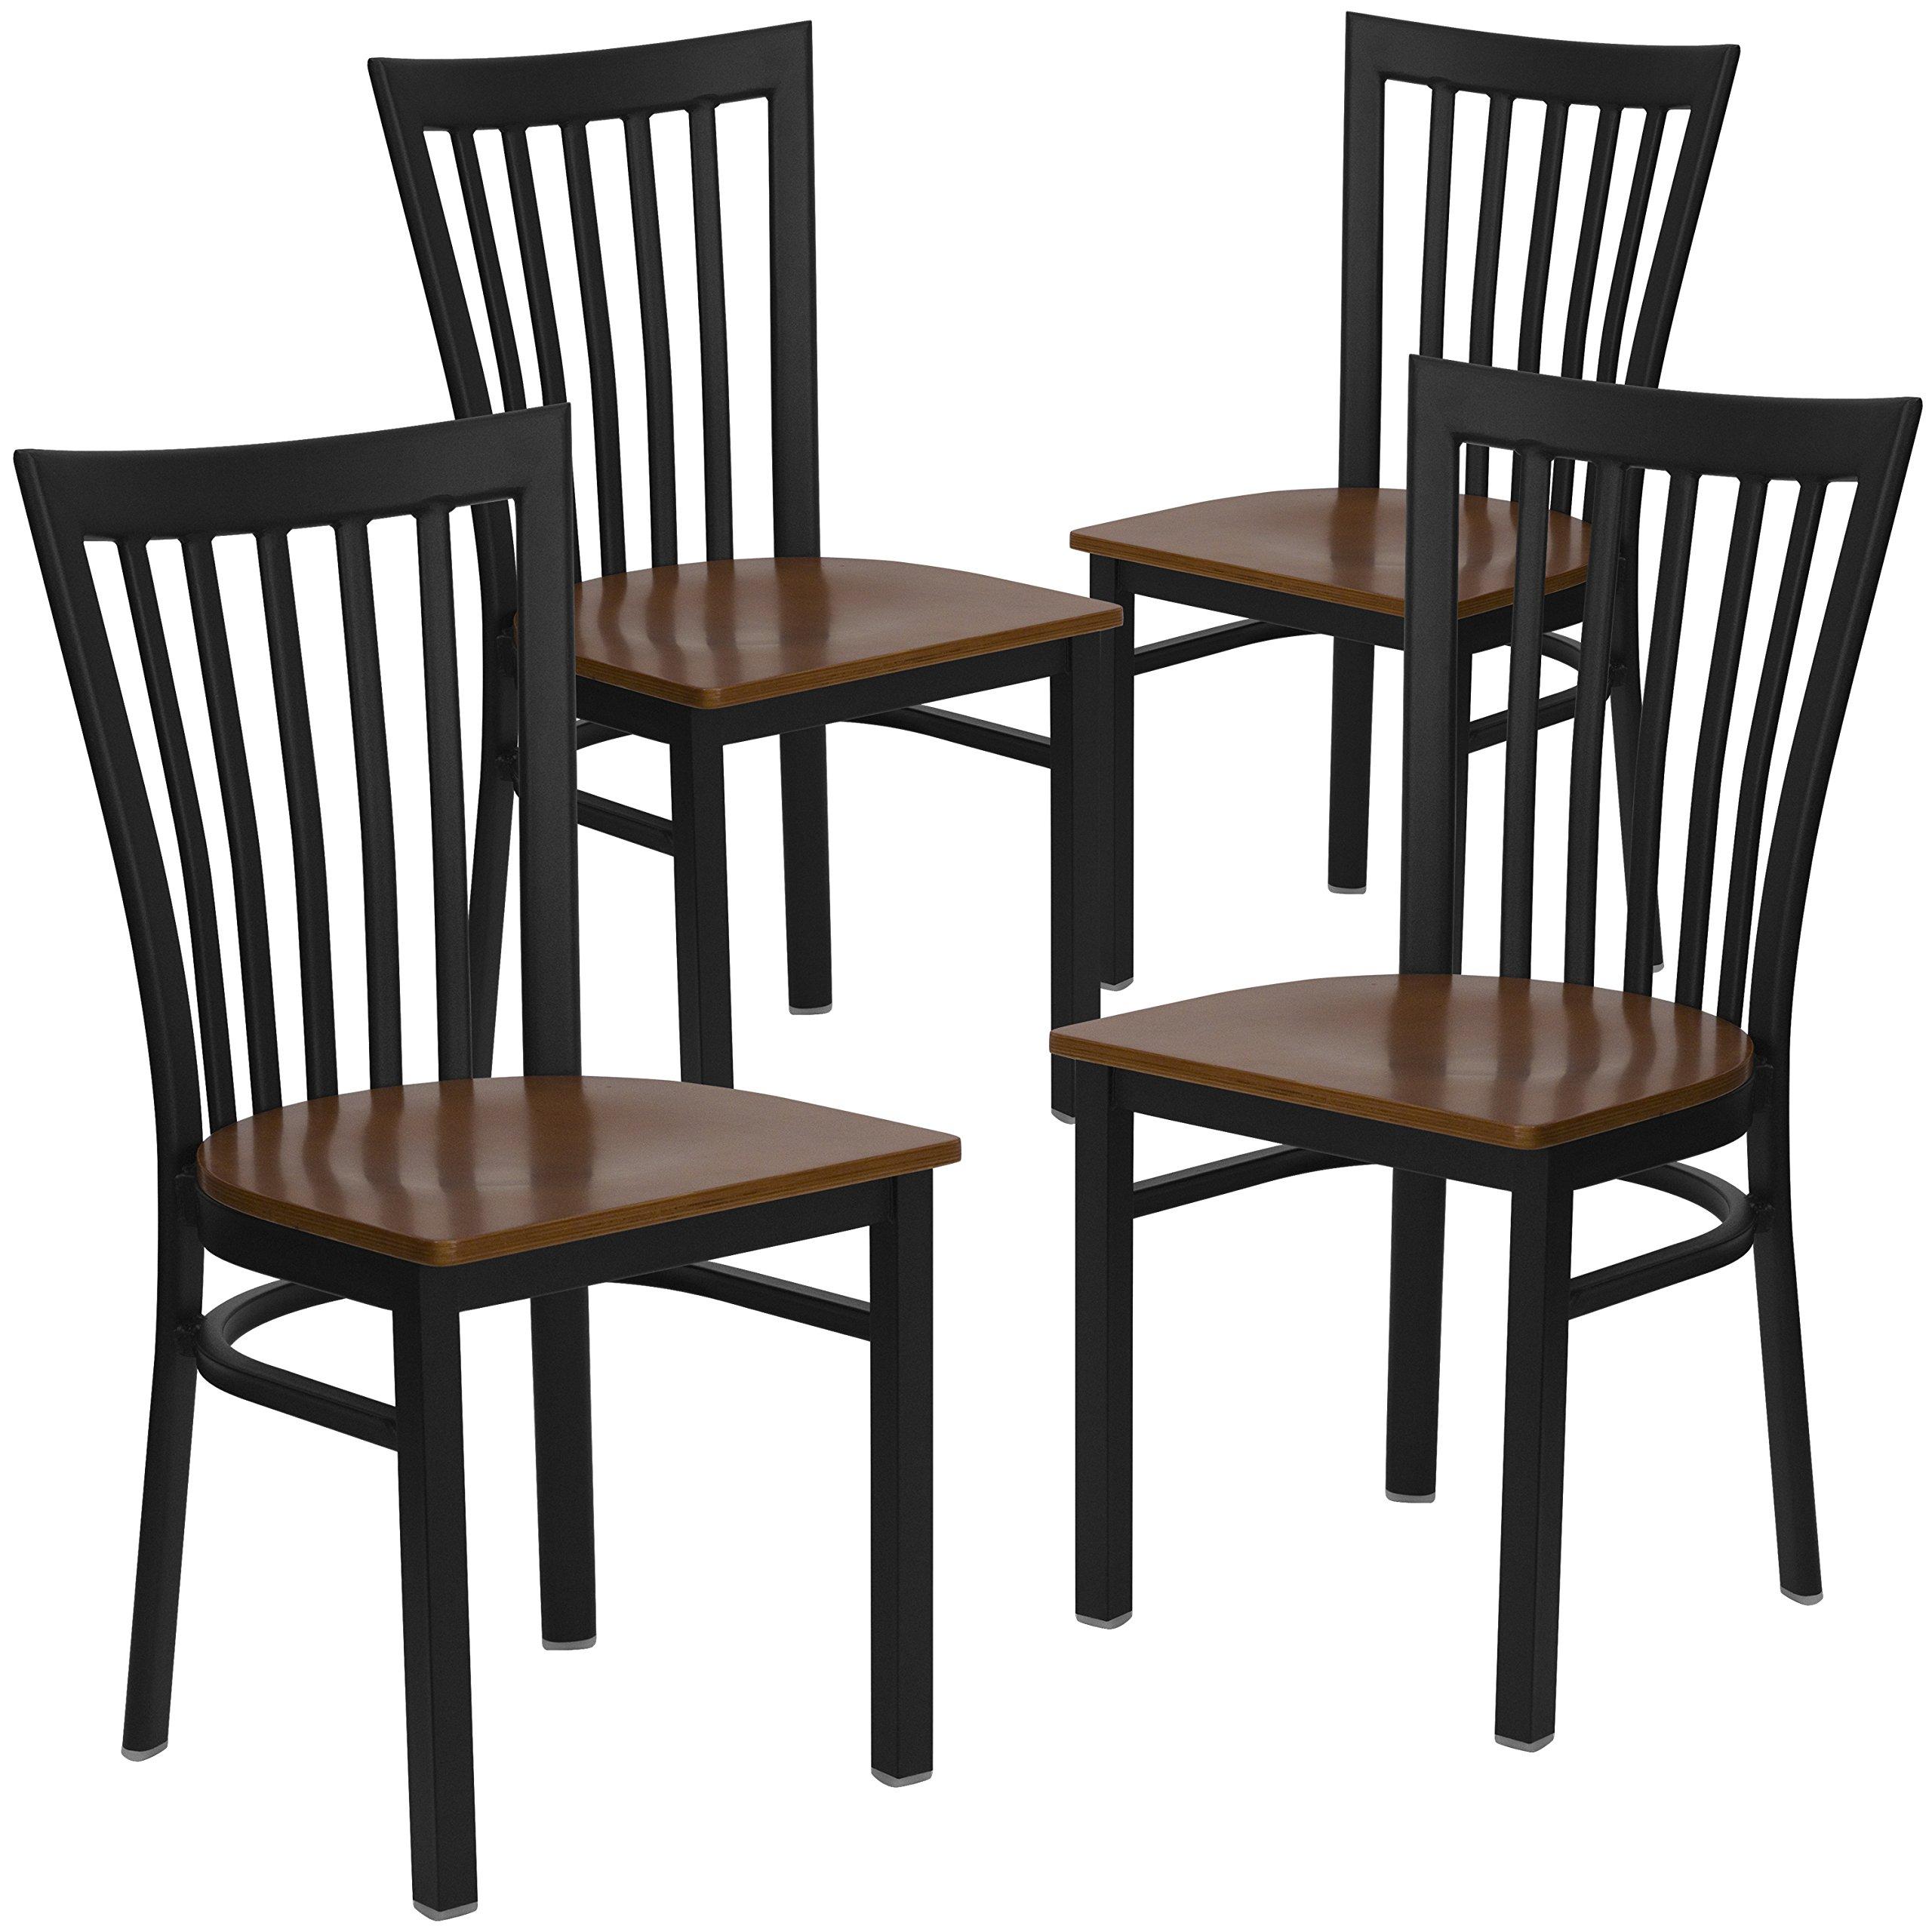 Flash Furniture 4 Pk. HERCULES Series Black School House Back Metal Restaurant Chair - Cherry Wood Seat